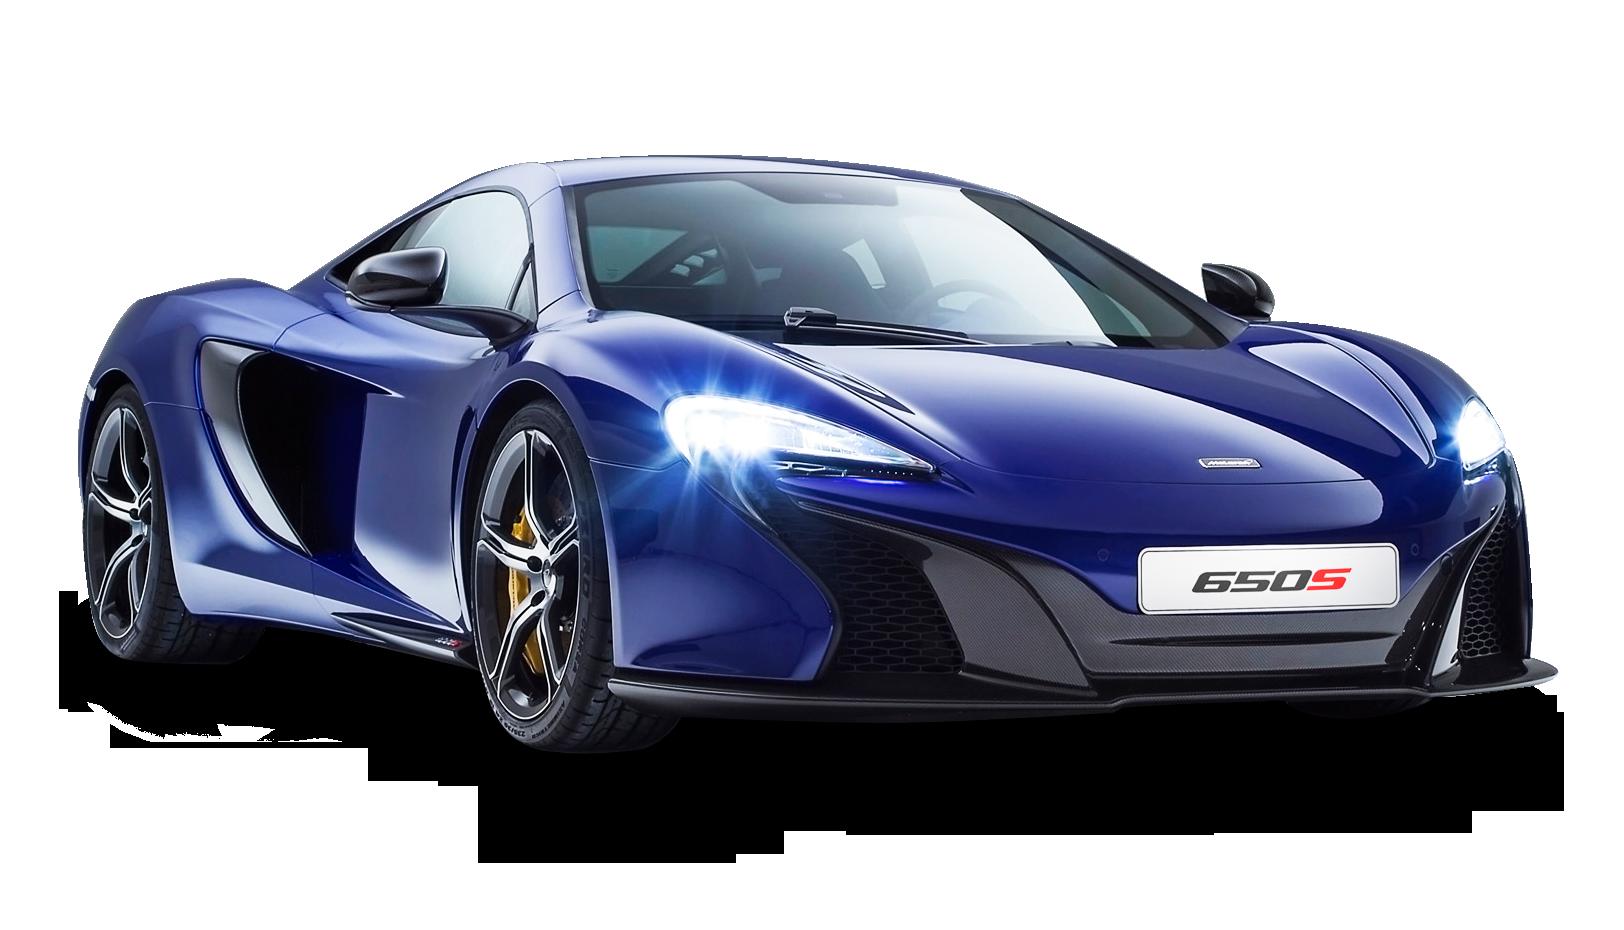 McLaren 650S Coupe Blue Car PNG Image - PurePNG   Free ...